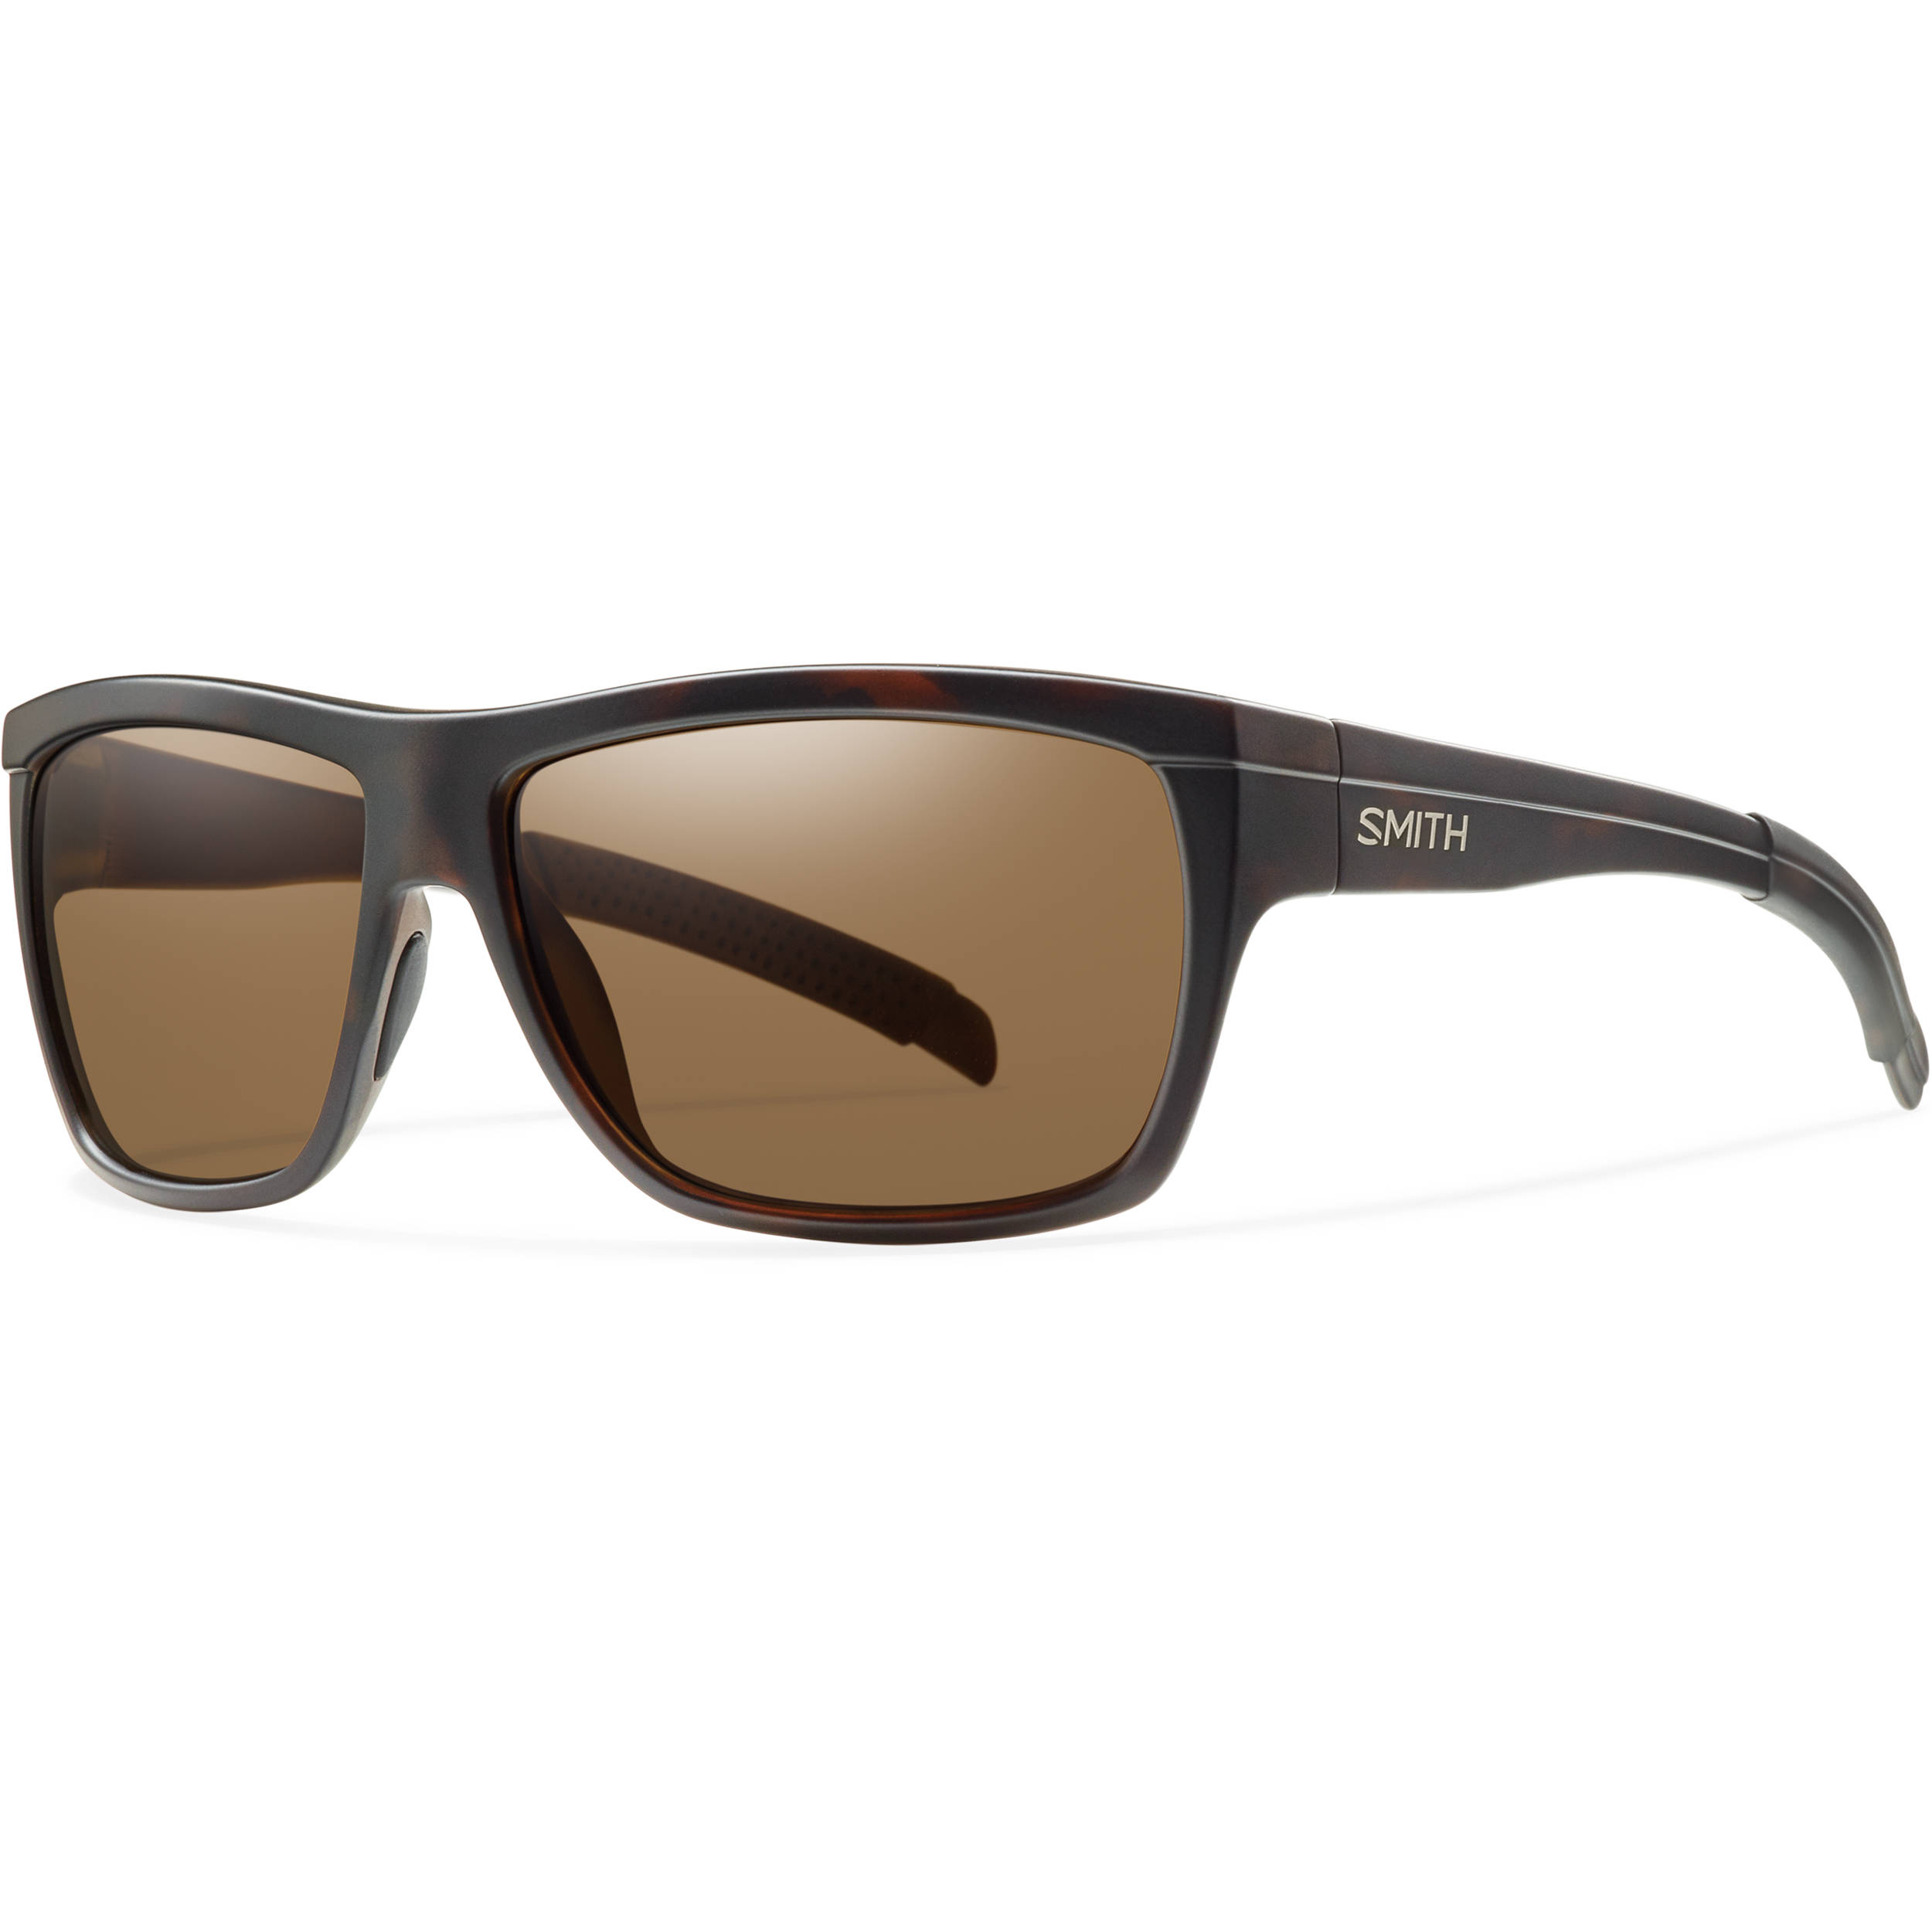 Smith sunglasses polarized tlt for Smith fishing sunglasses